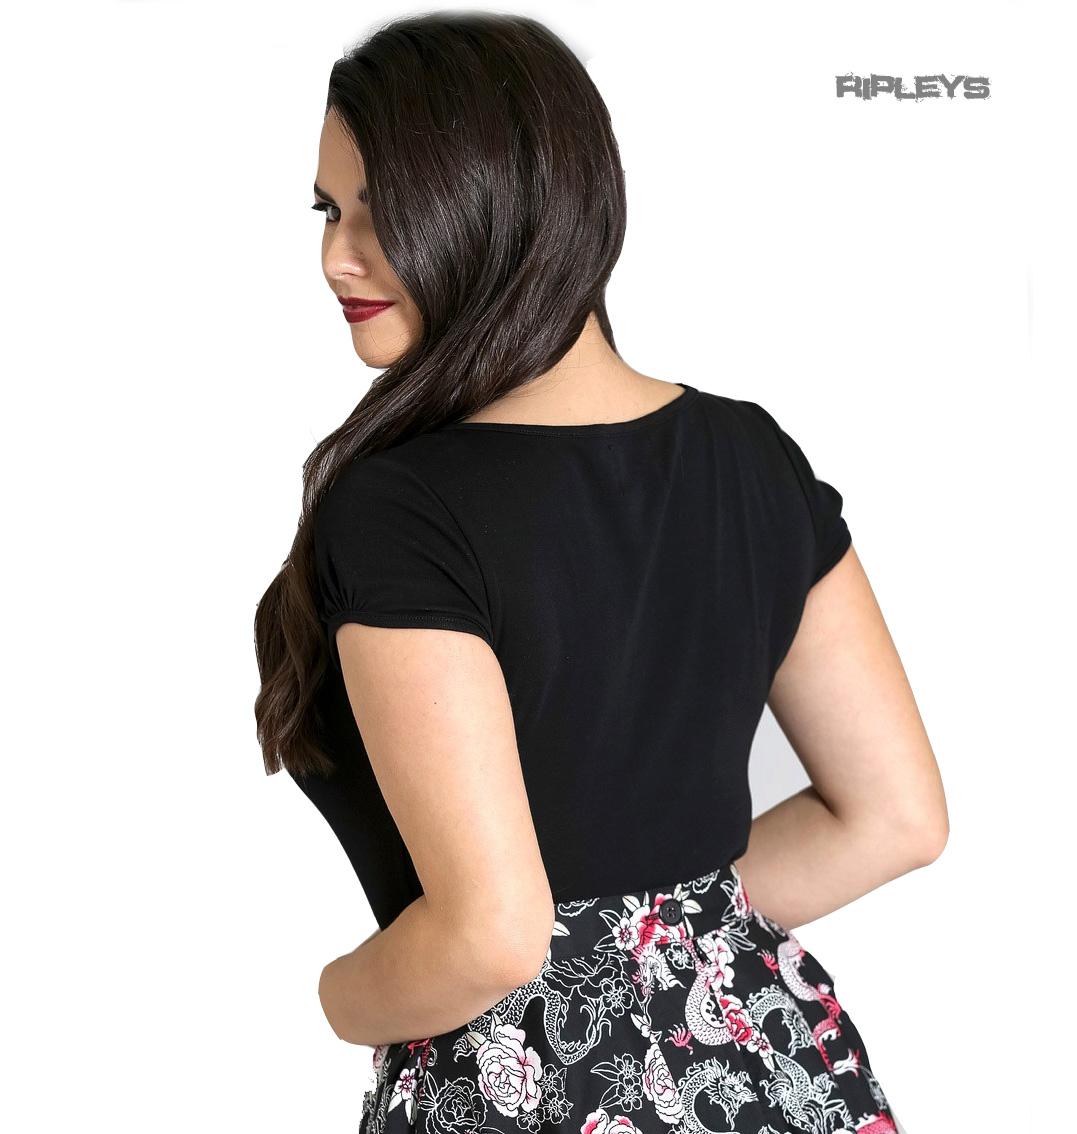 Hell-Bunny-Shirt-50s-Rockabilly-Top-MIA-Plain-Black-Short-Sleeves-All-Sizes thumbnail 22